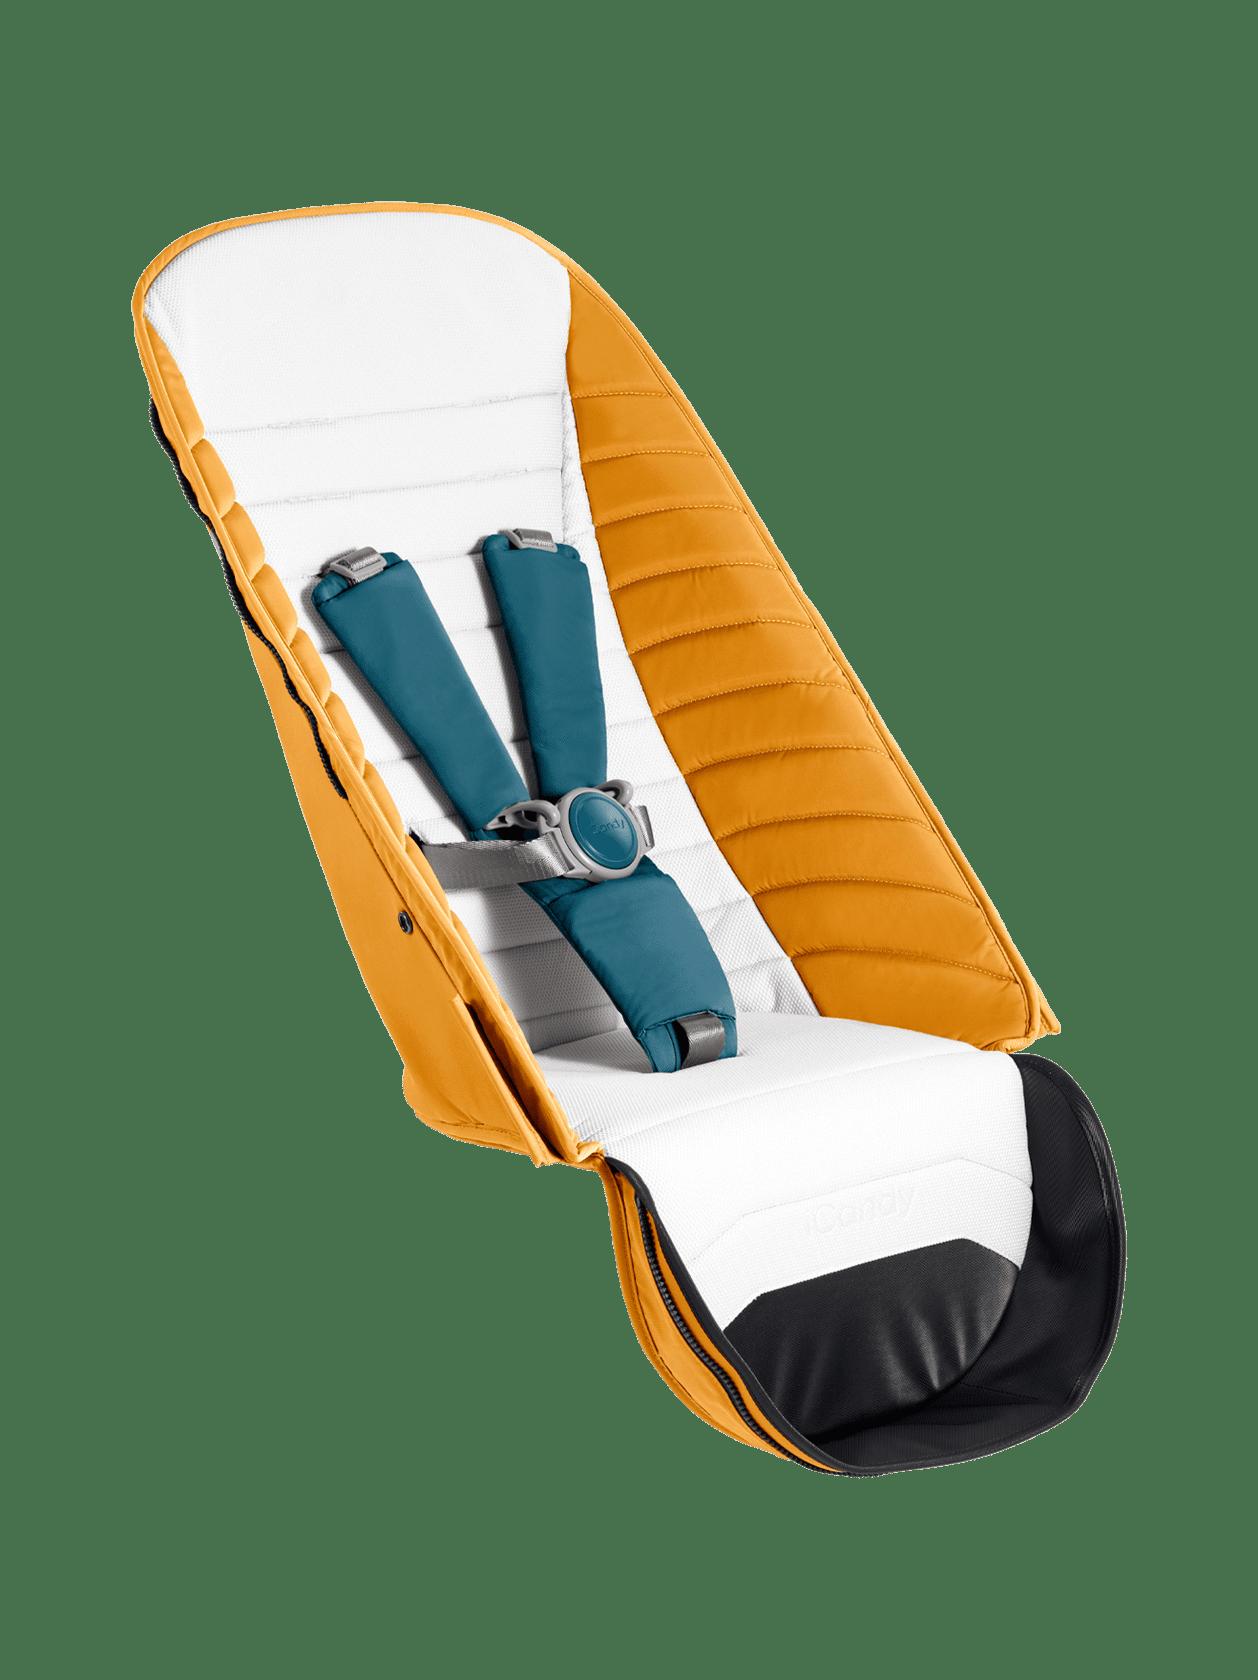 Peach 2nd Seat Fabric - Nectar